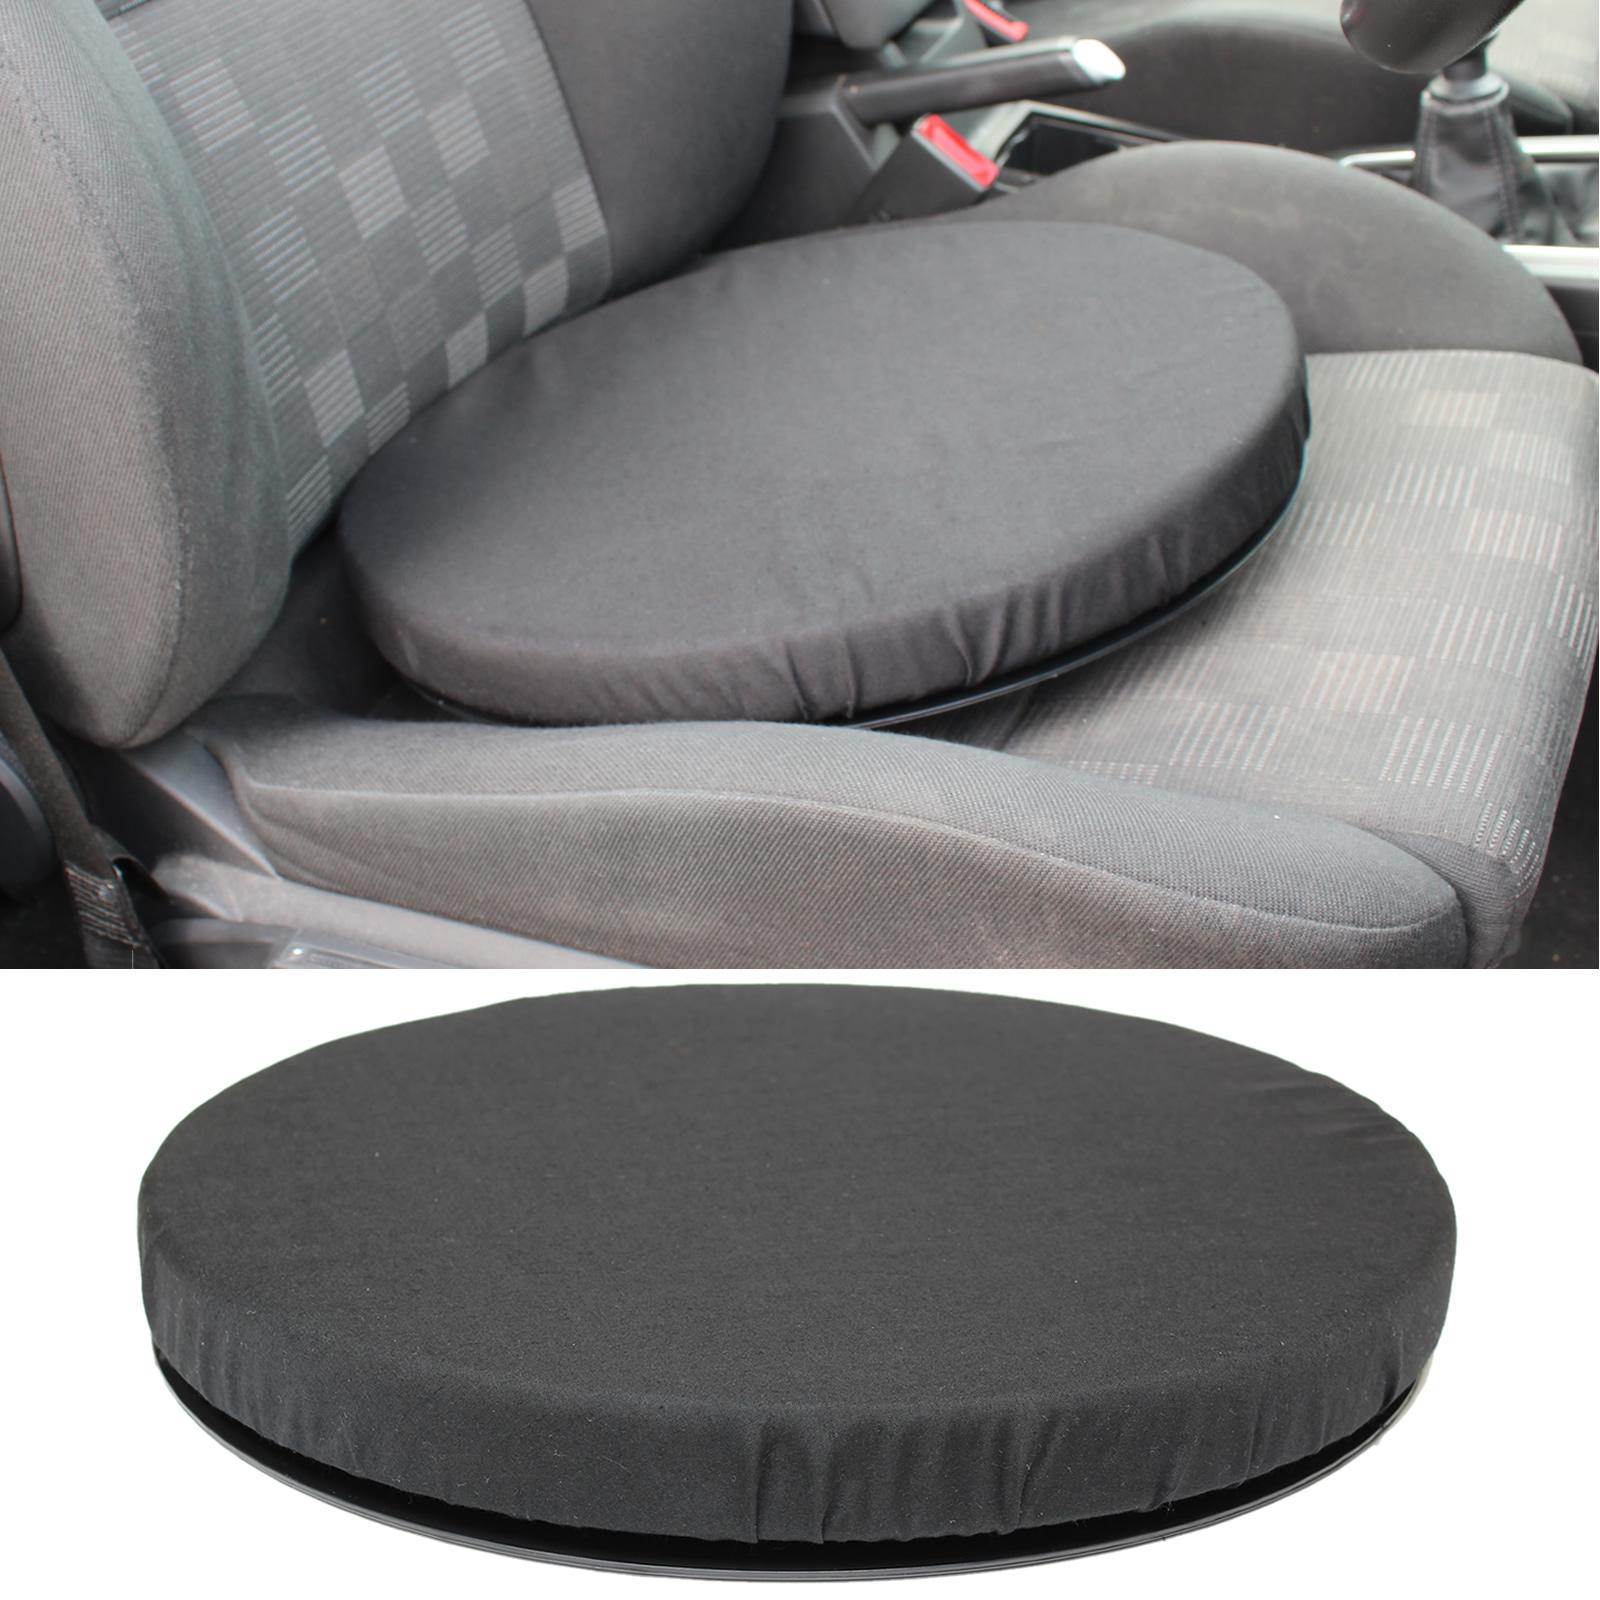 Black Memory Foam Rotating Seat Chair Swivel Cushion Chair